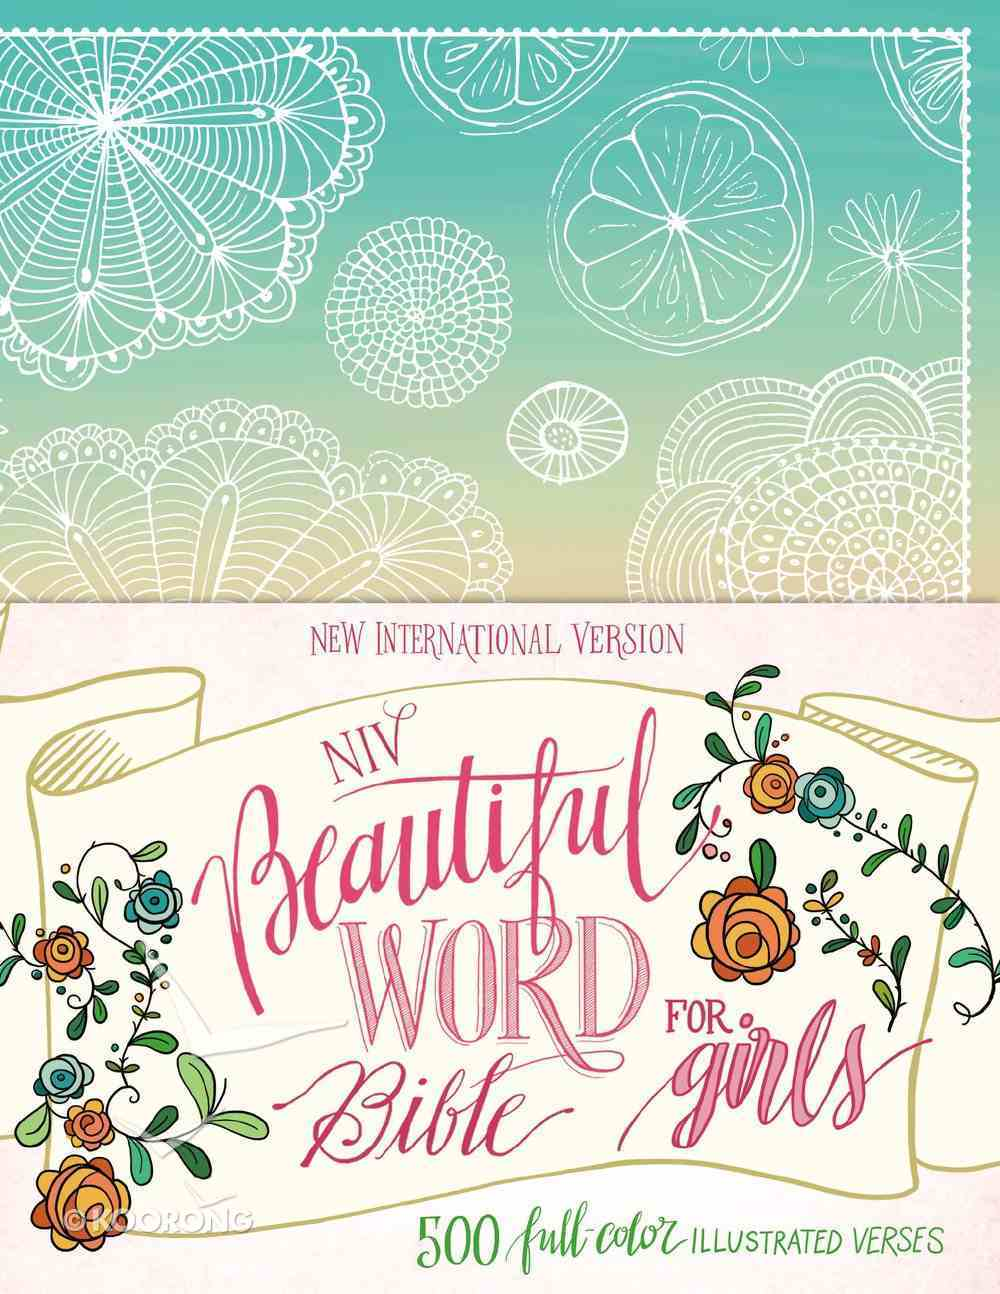 NIV Beautiful Word Bible For Girls Floral (Black Letter Edition) Hardback